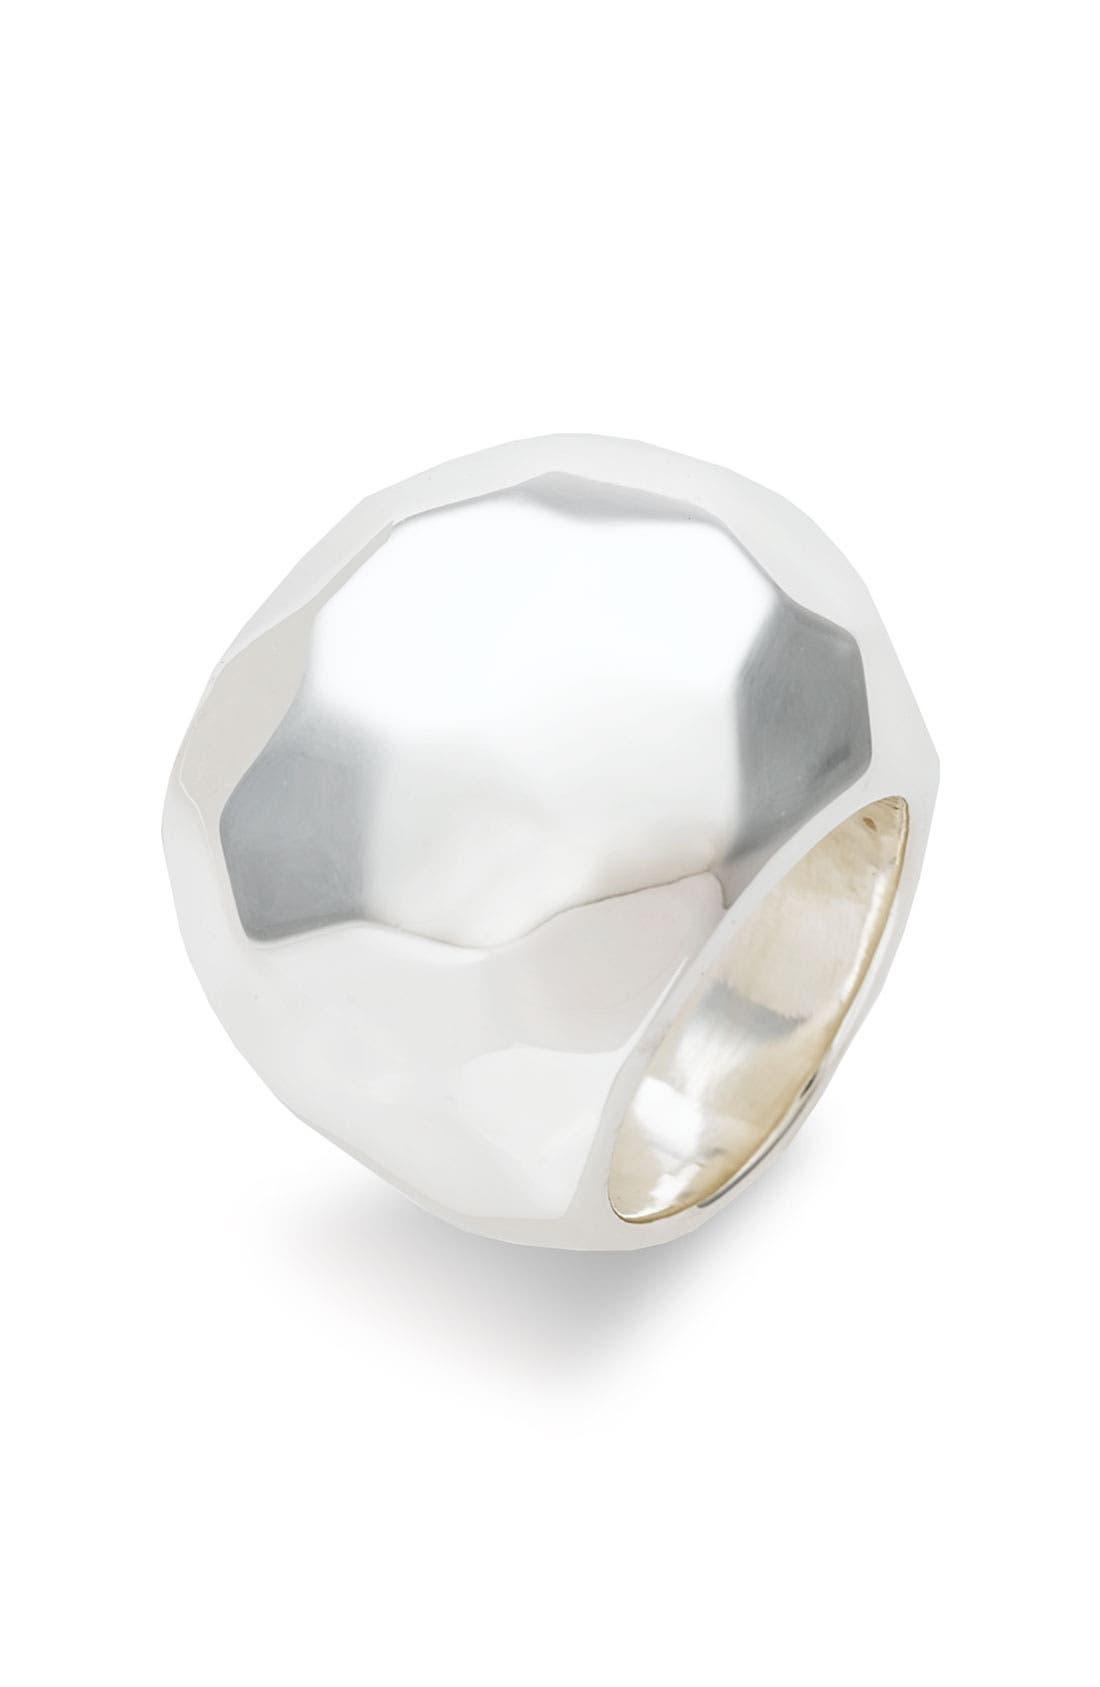 Main Image - Simon Sebbag Curved Ring